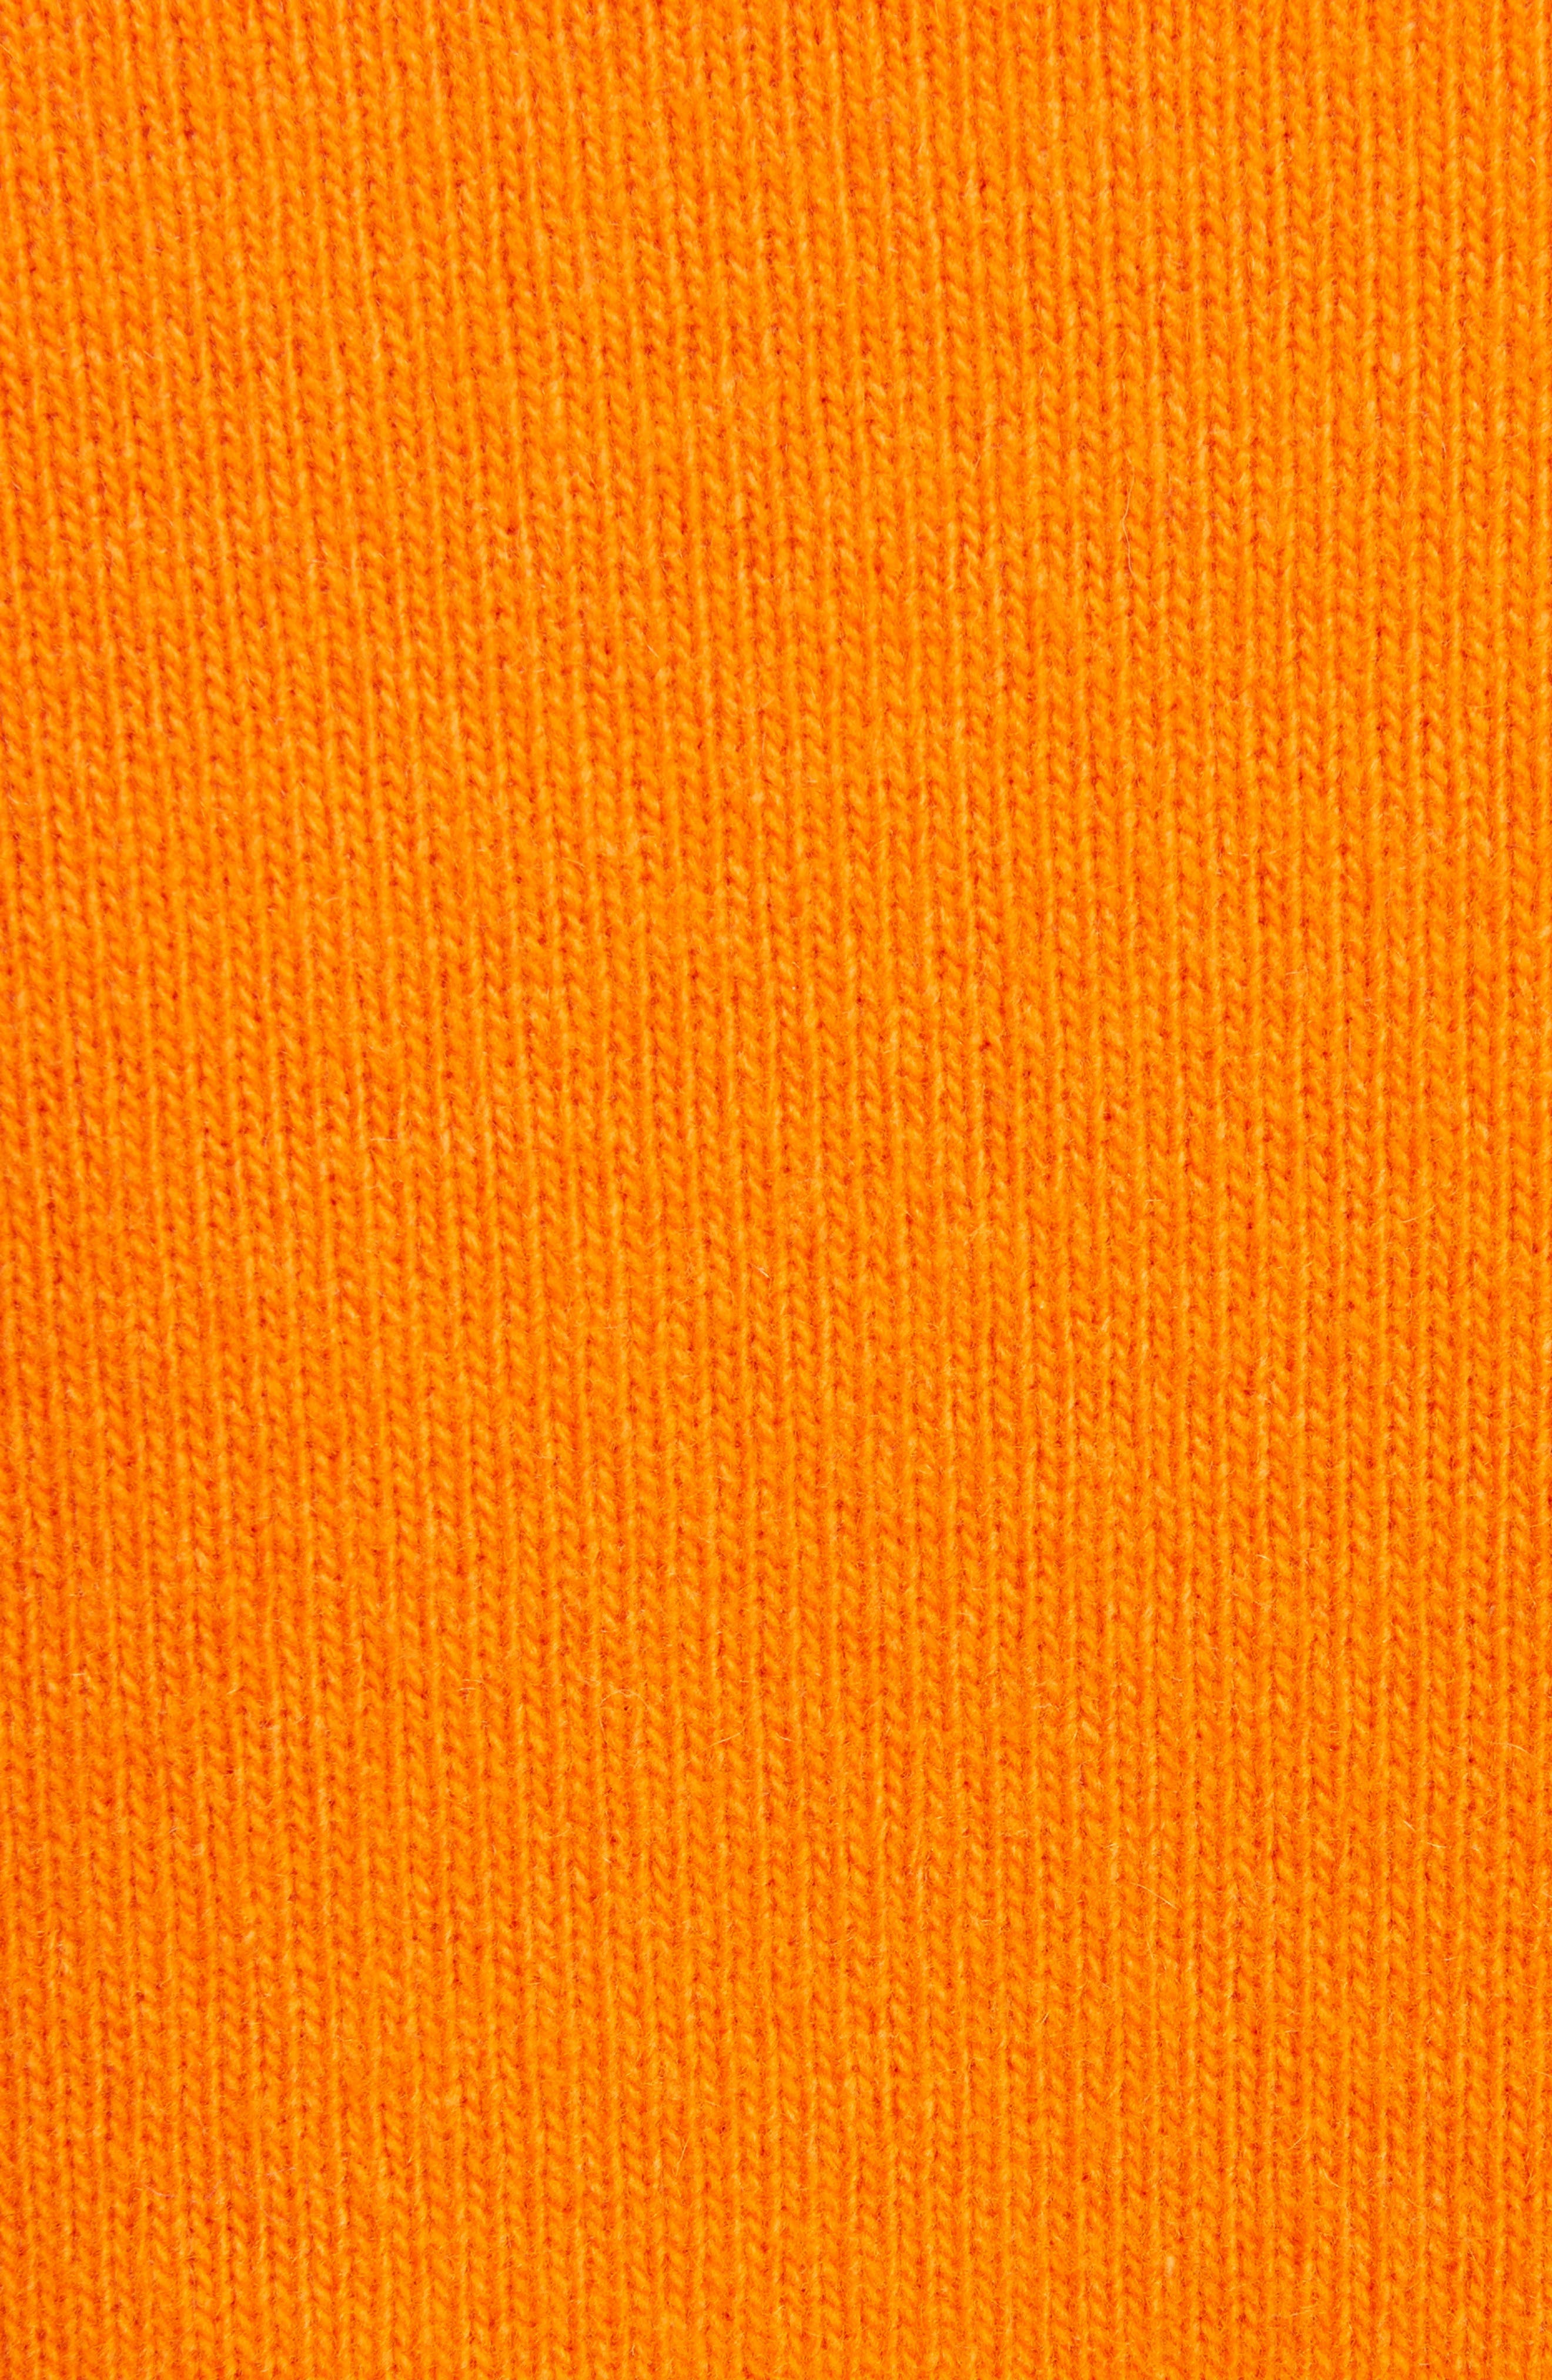 Alternate Image 3  - J.W.ANDERSON Multi Pocket Crewneck Sweater